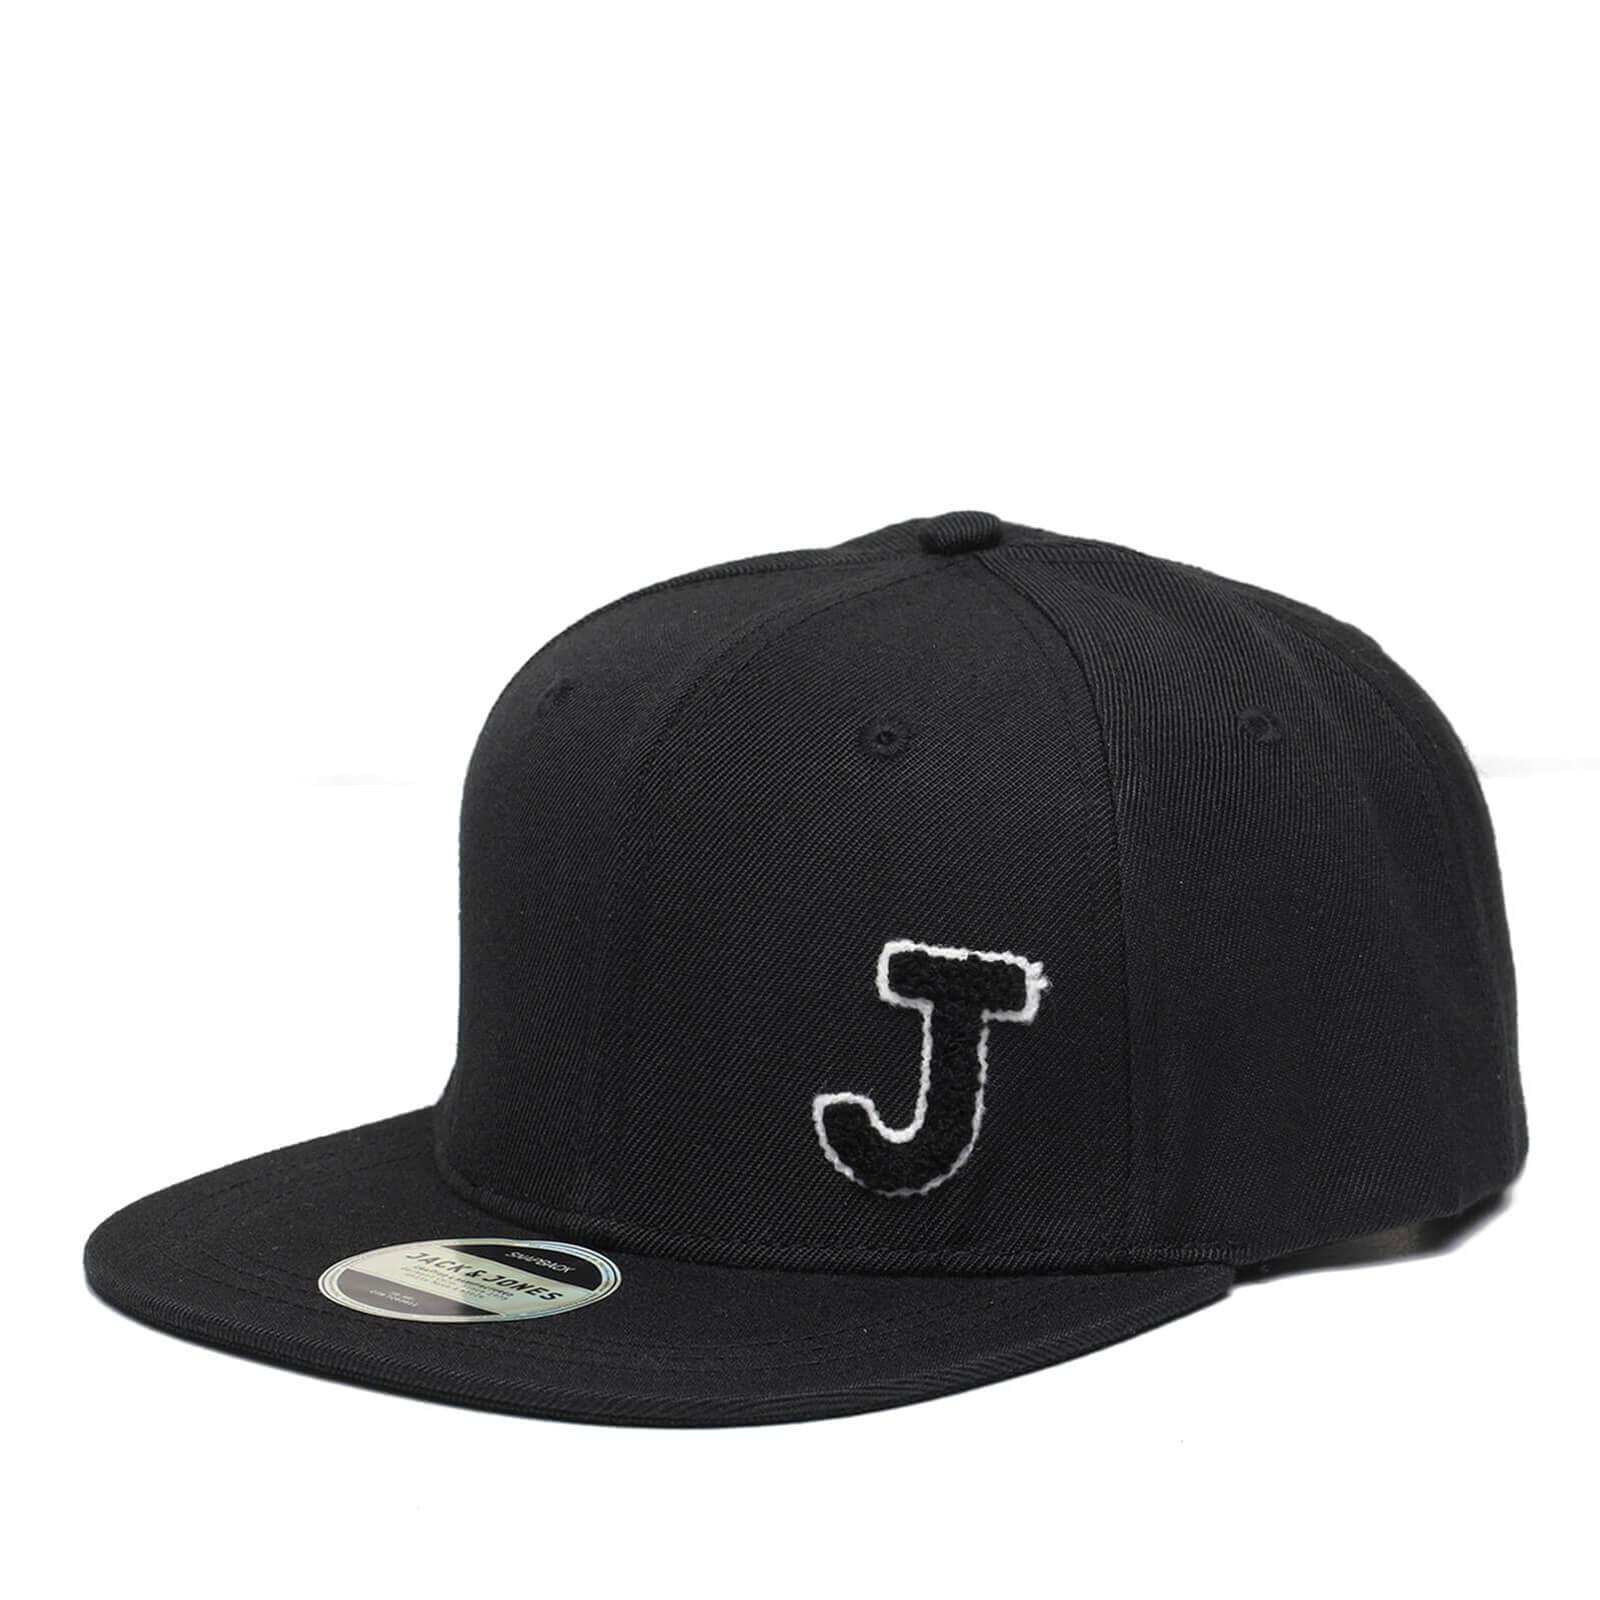 310e21a50 Jack & Jones Men's Terry Snapback Cap - Black Clothing | Zavvi